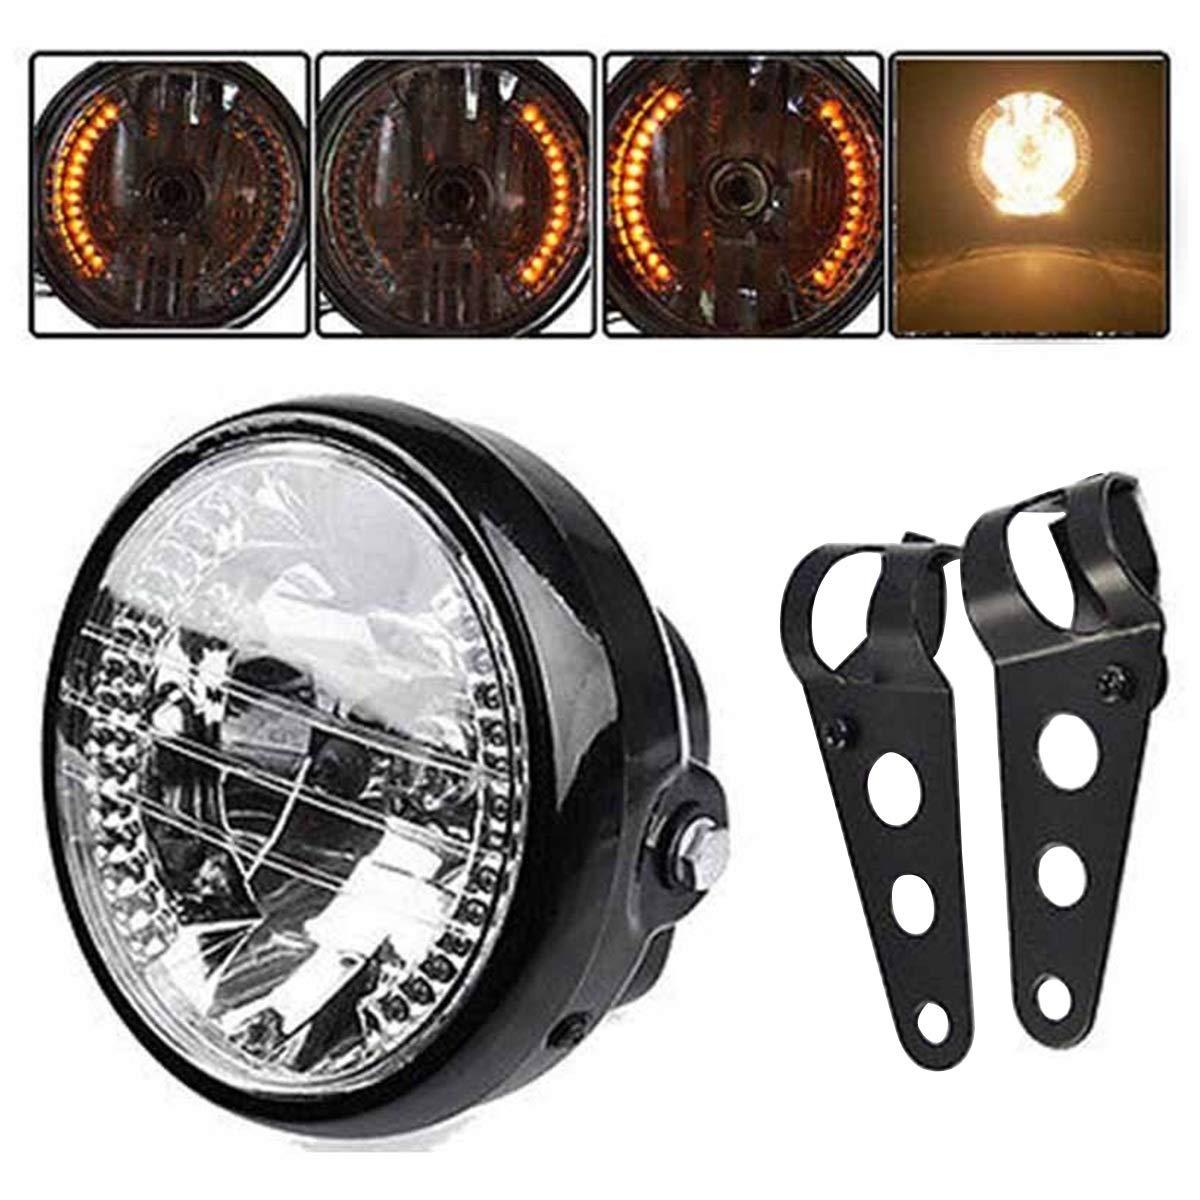 Universal 7' Vintage Style Motorcycle Headlight LED Turn Signal Light + Mount Bracket Black HA-01